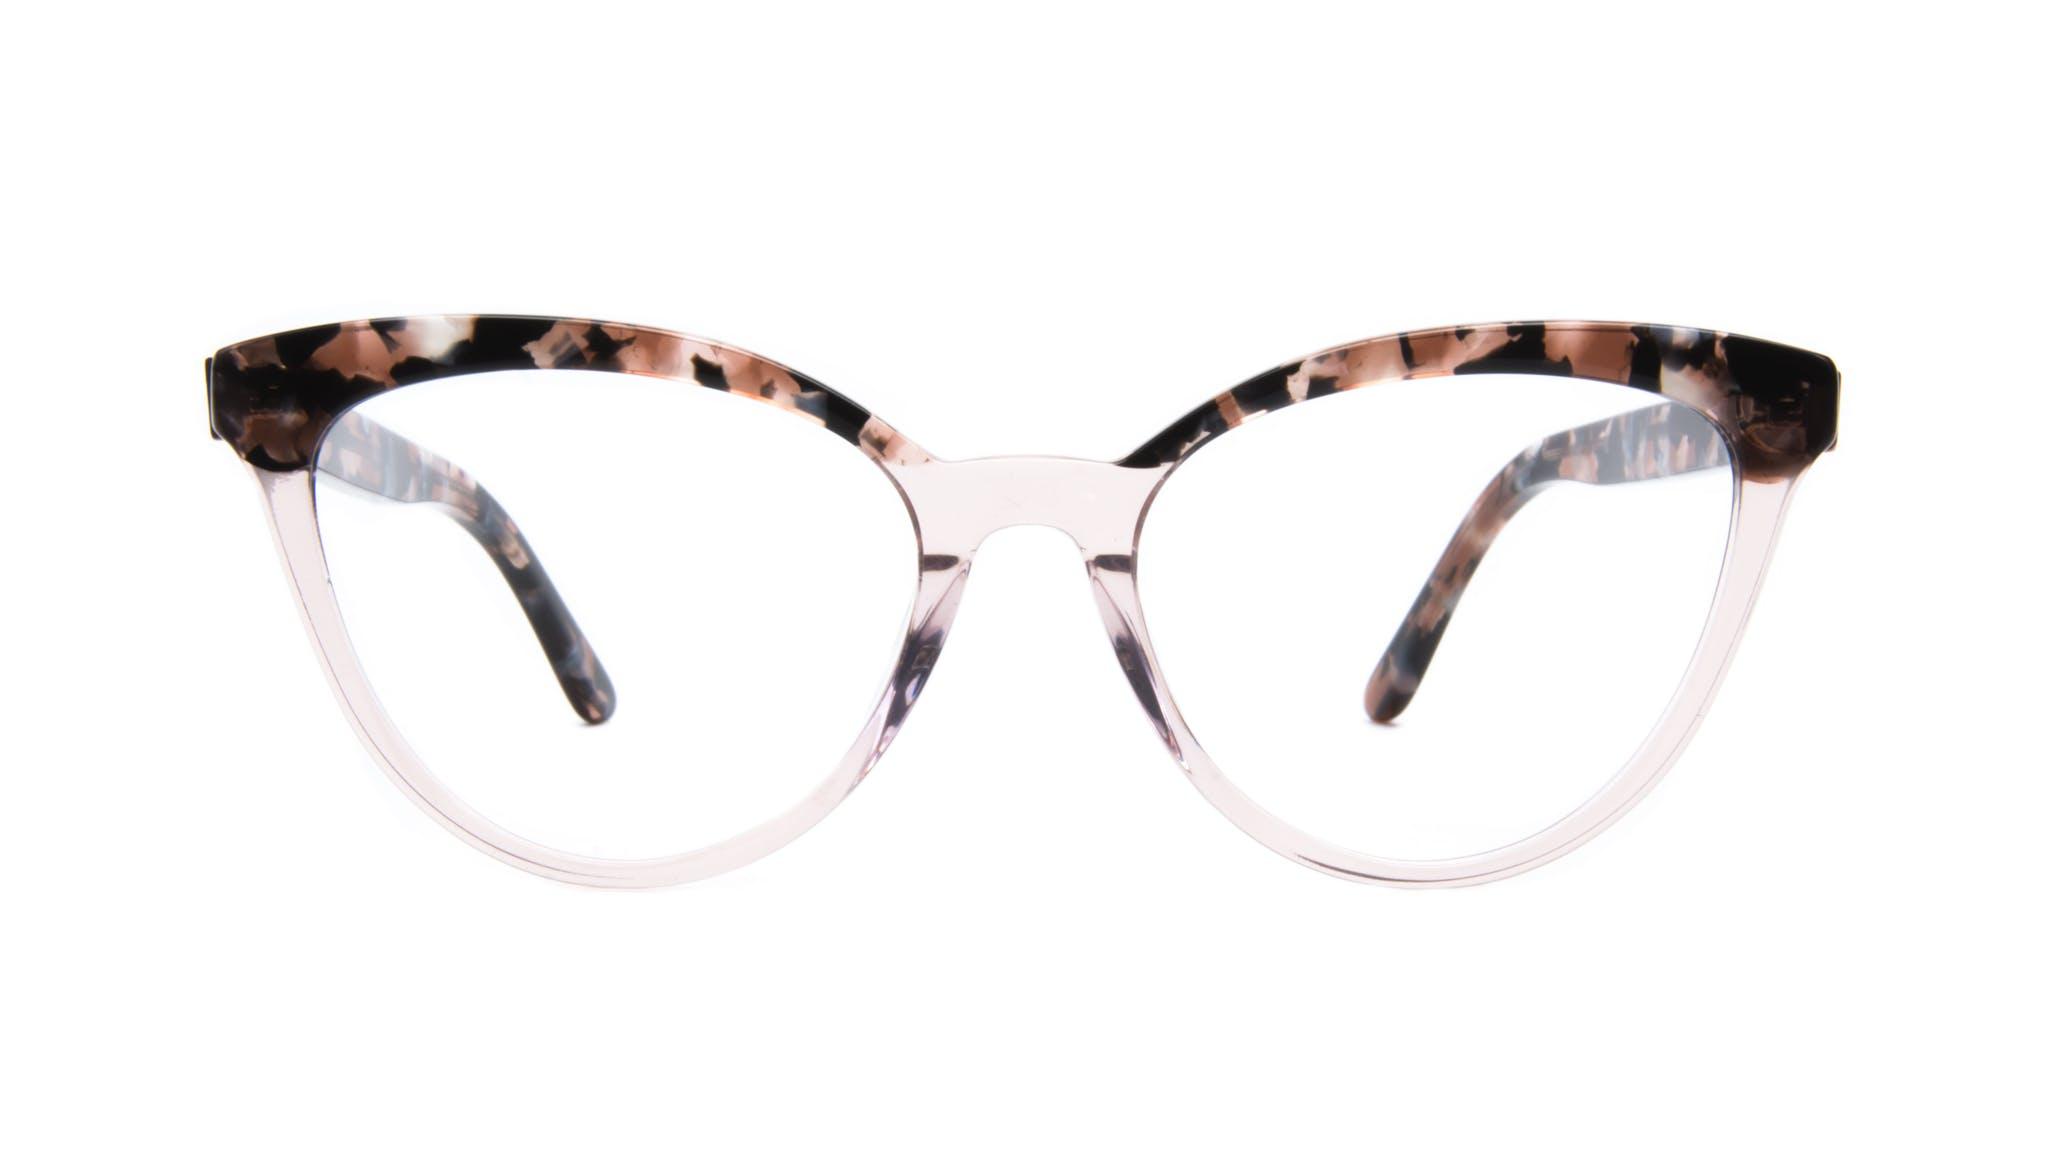 Affordable Fashion Glasses Cat Eye Daring Cateye Eyeglasses Women Reverie Rose Tort